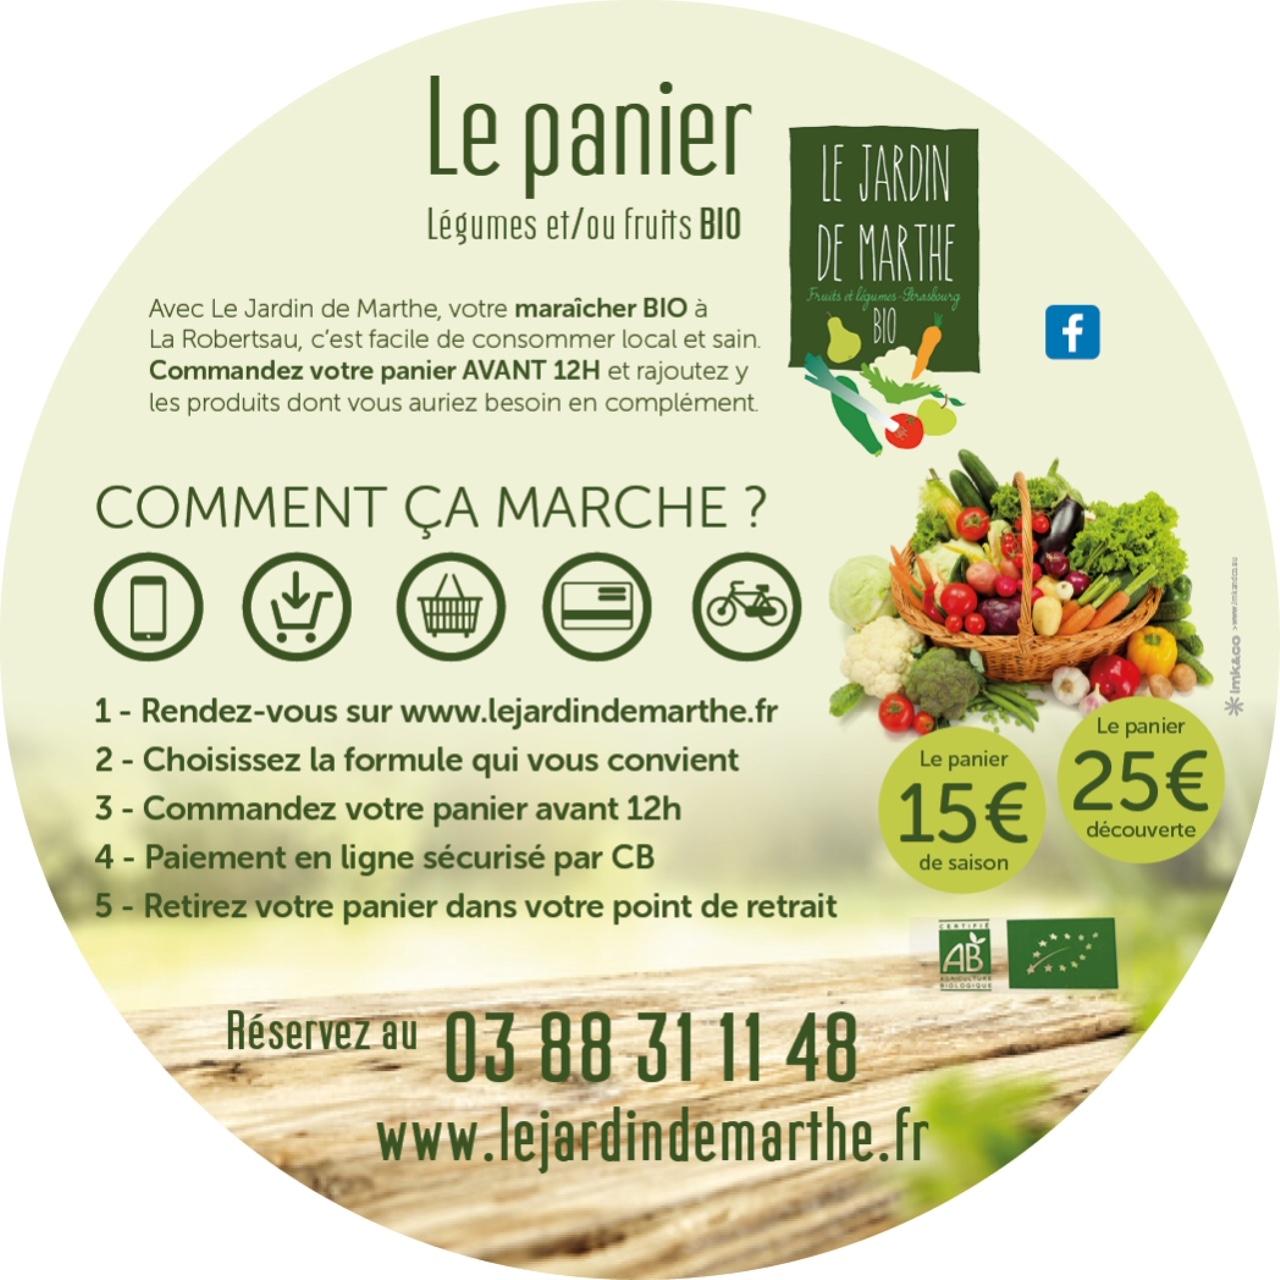 MARTHE_flyerrond148mm-panier2017v42 - Le Jardin de Marthe ...